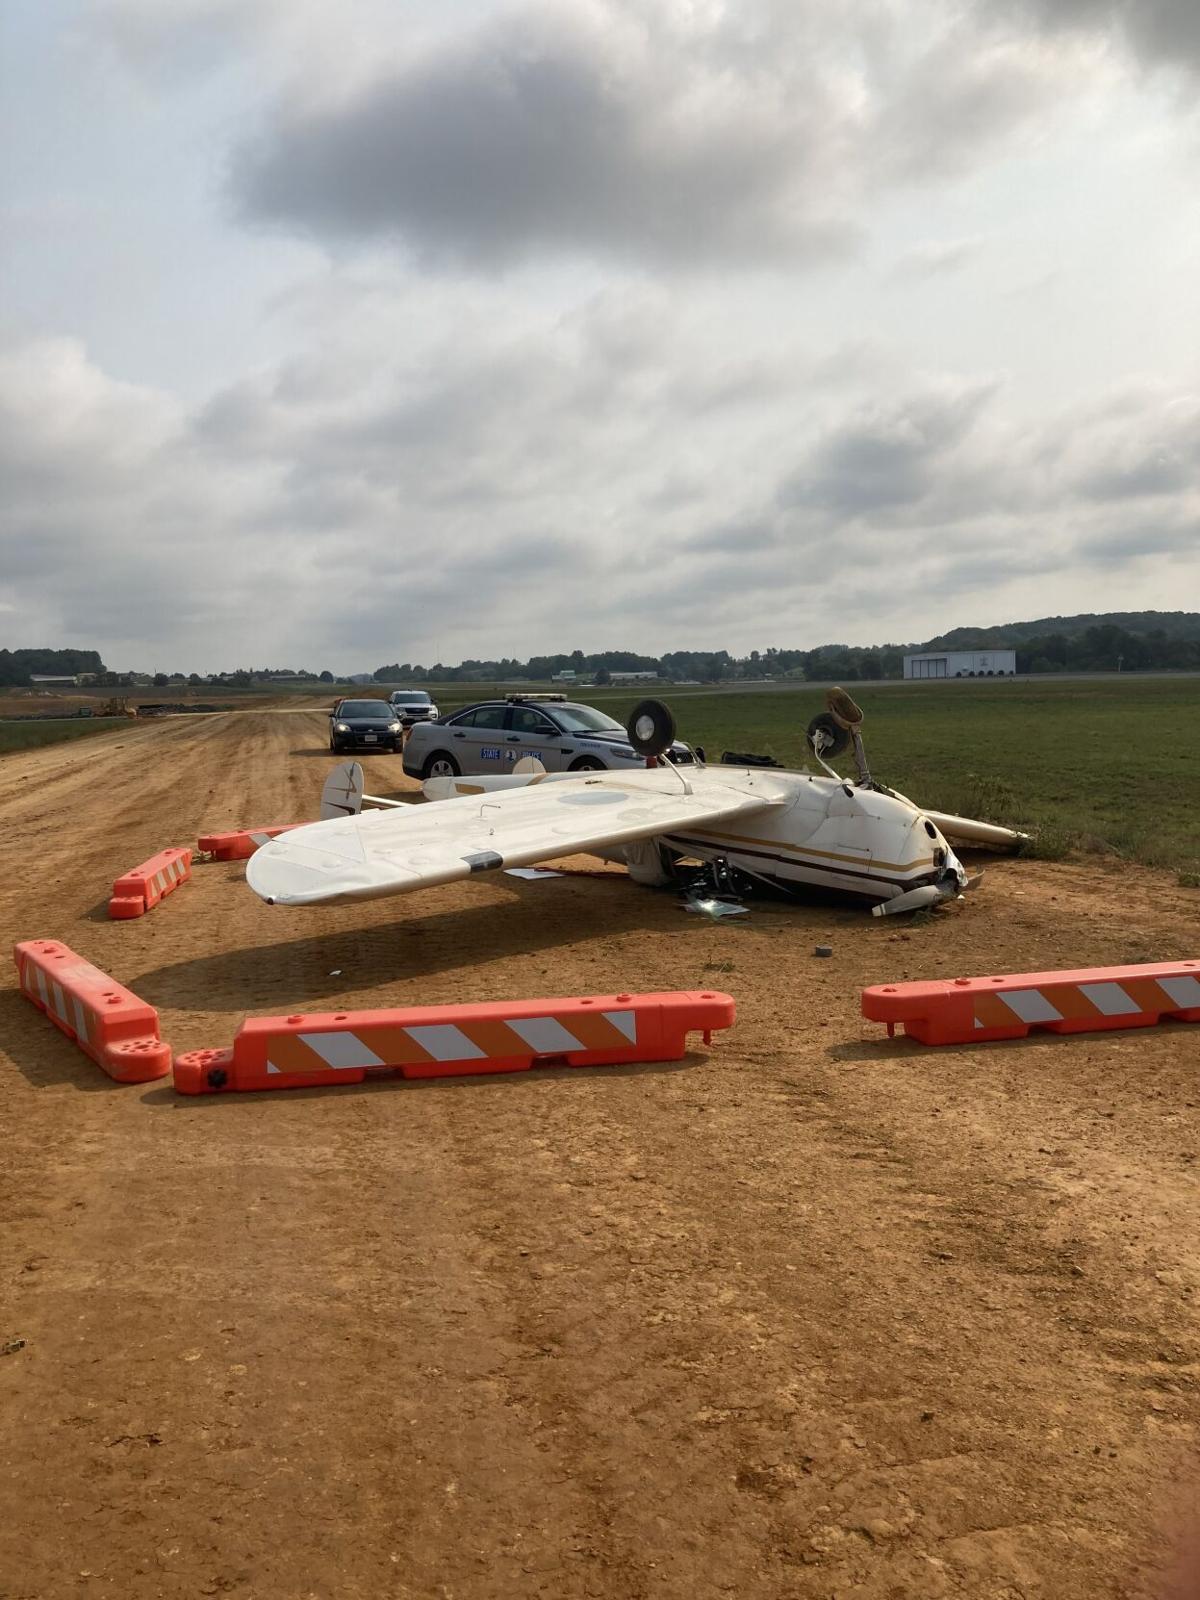 9-13-21 Airplane Crash at VA Highlands Airport